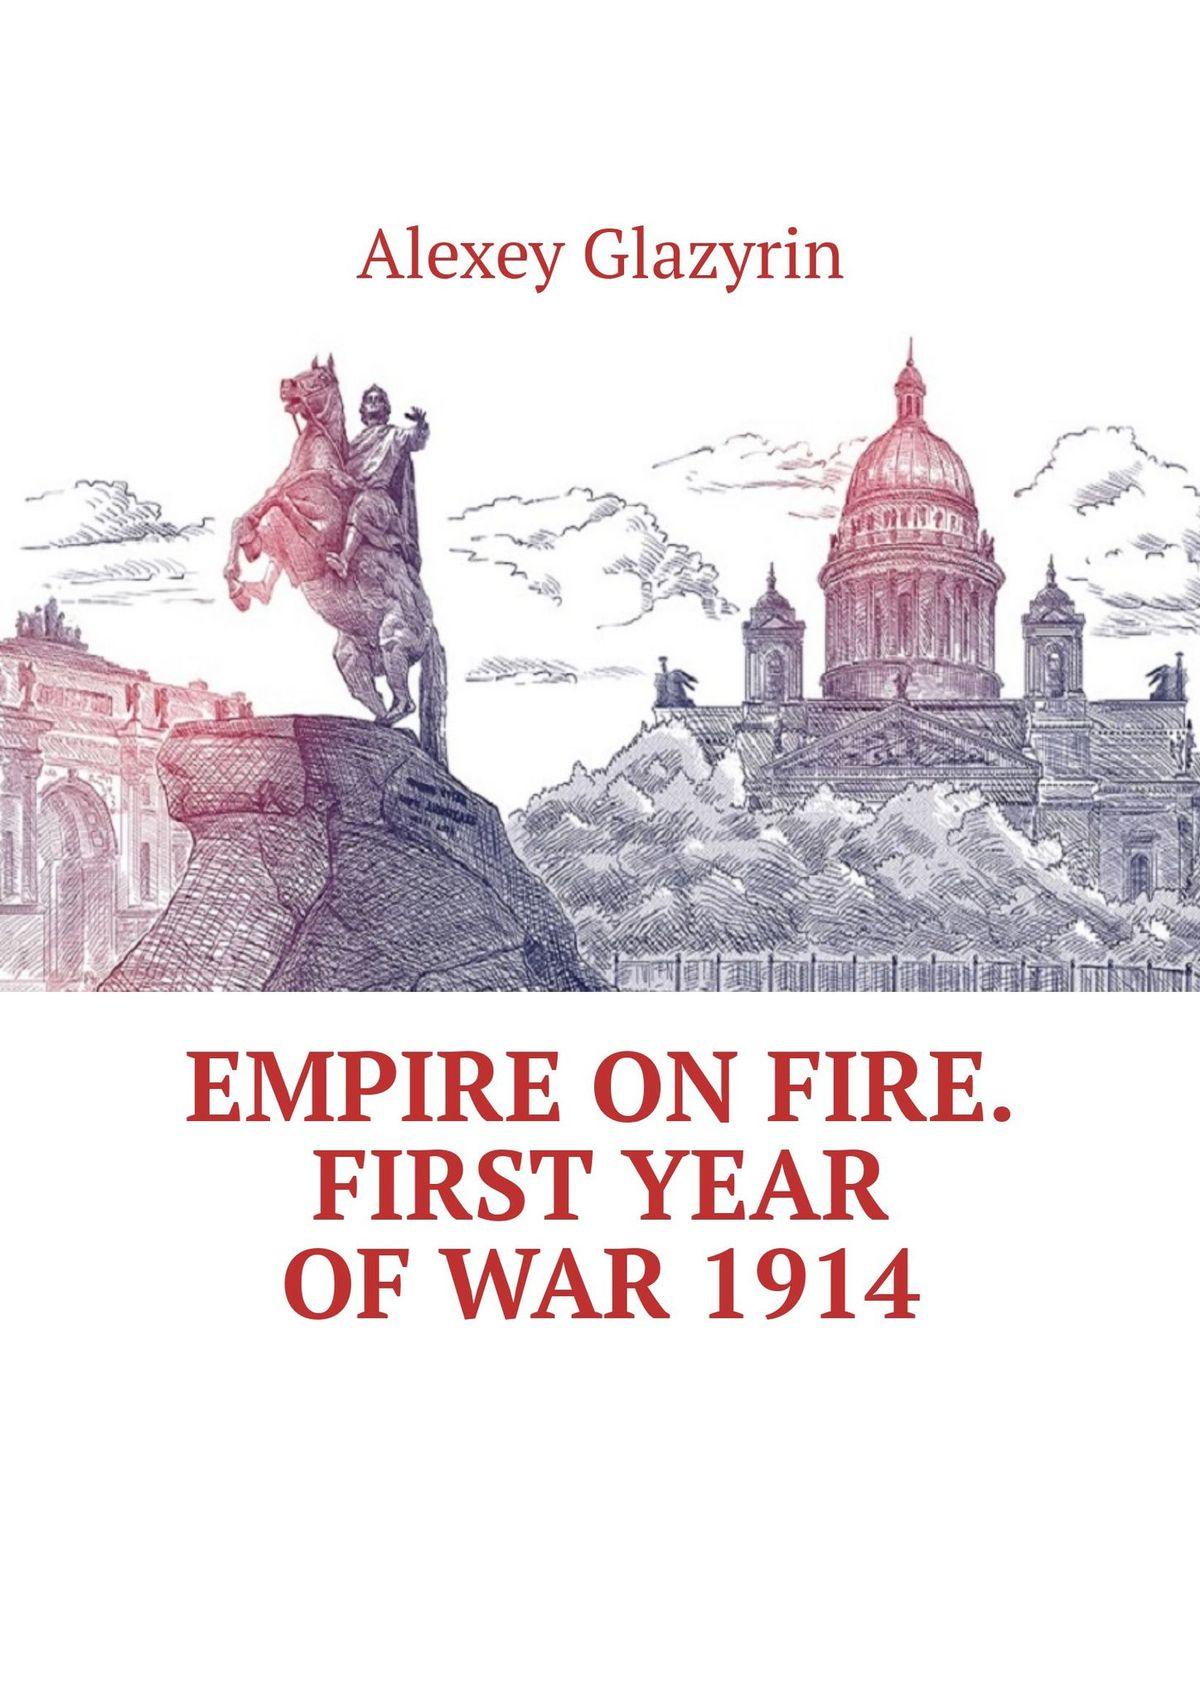 цена на Alexey Glazyrin Empire on fire. First year ofwar1914